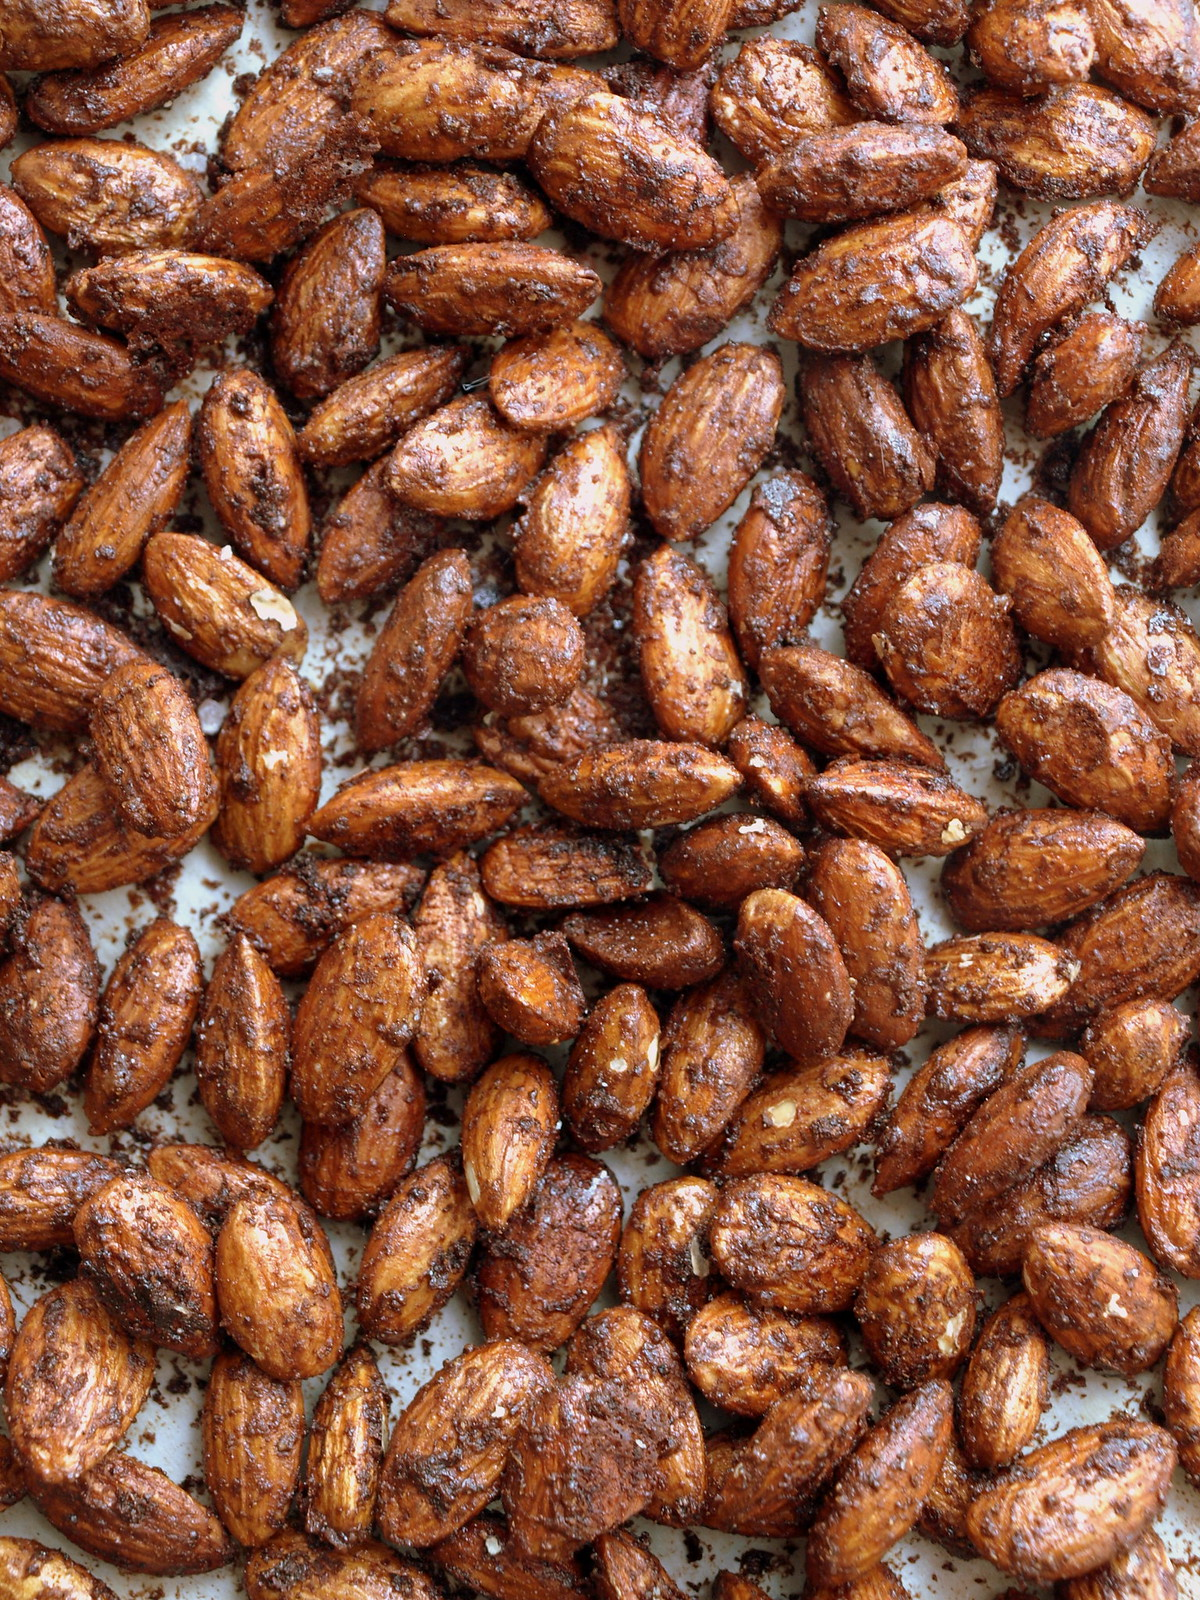 CHOCOLATE CHAI ROASTED ALMONDS